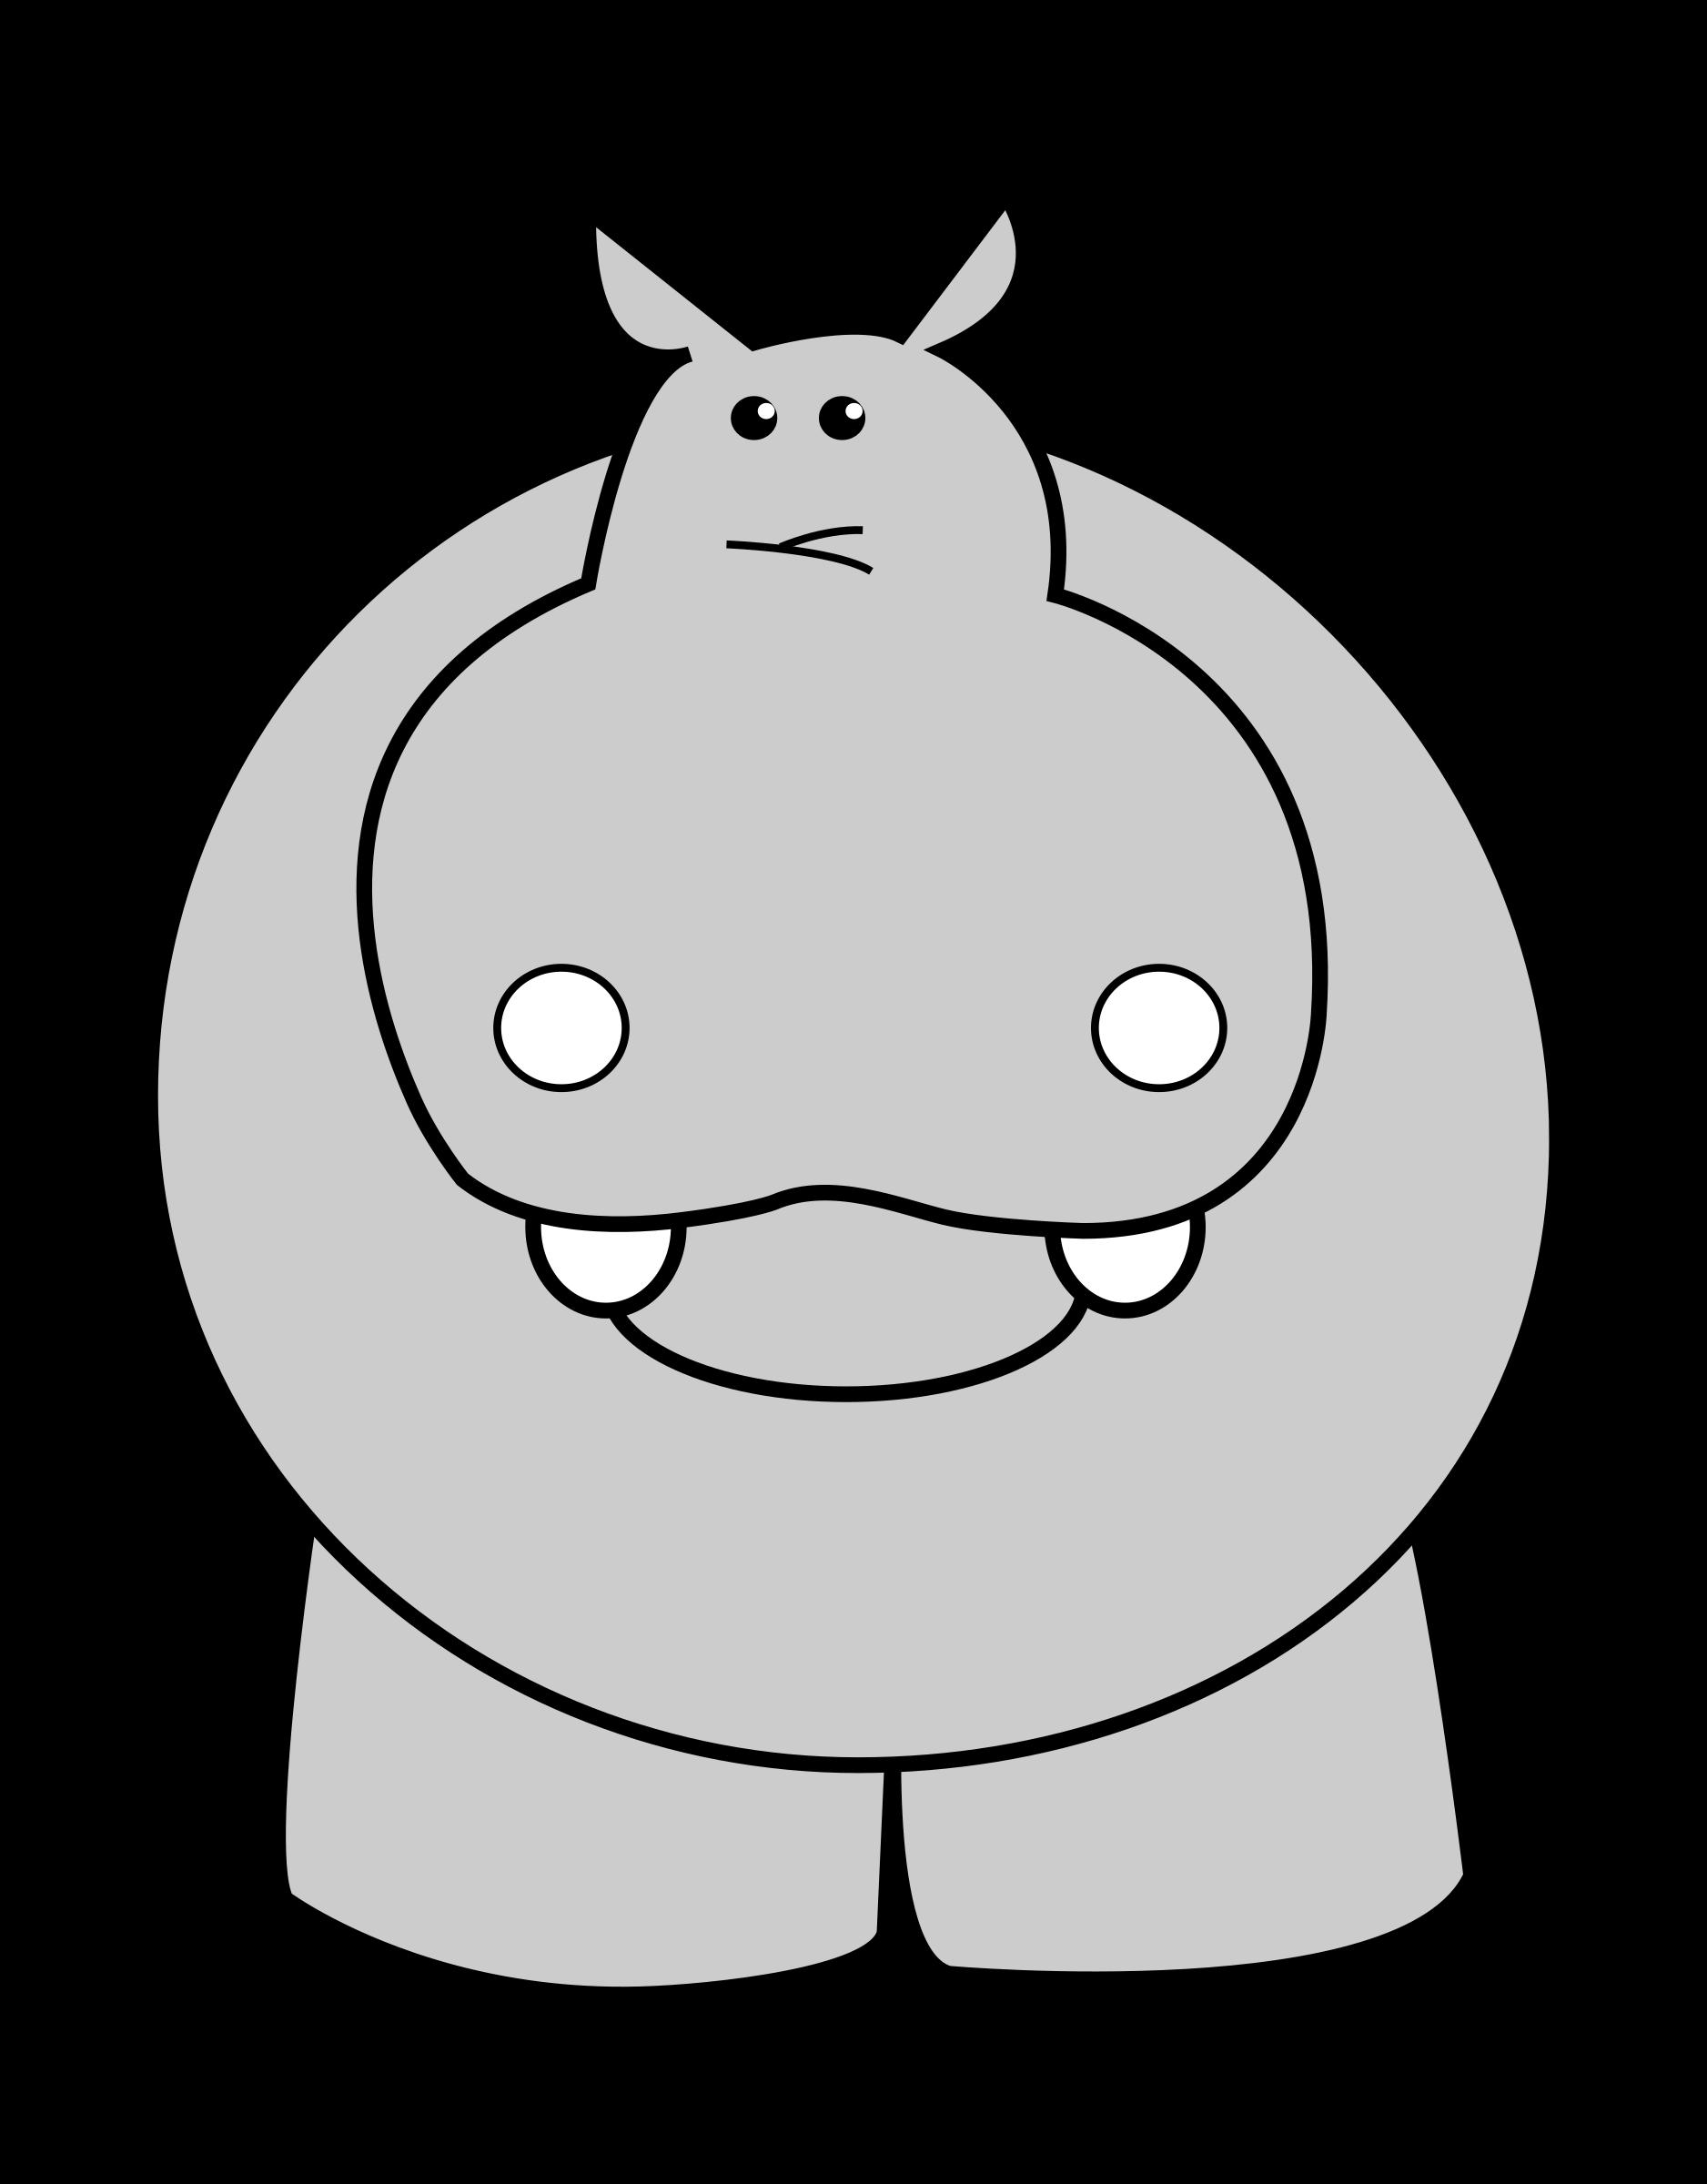 Hippo Clip Art Hippo Clipart-Hippo Clip Art Hippo Clipart-17